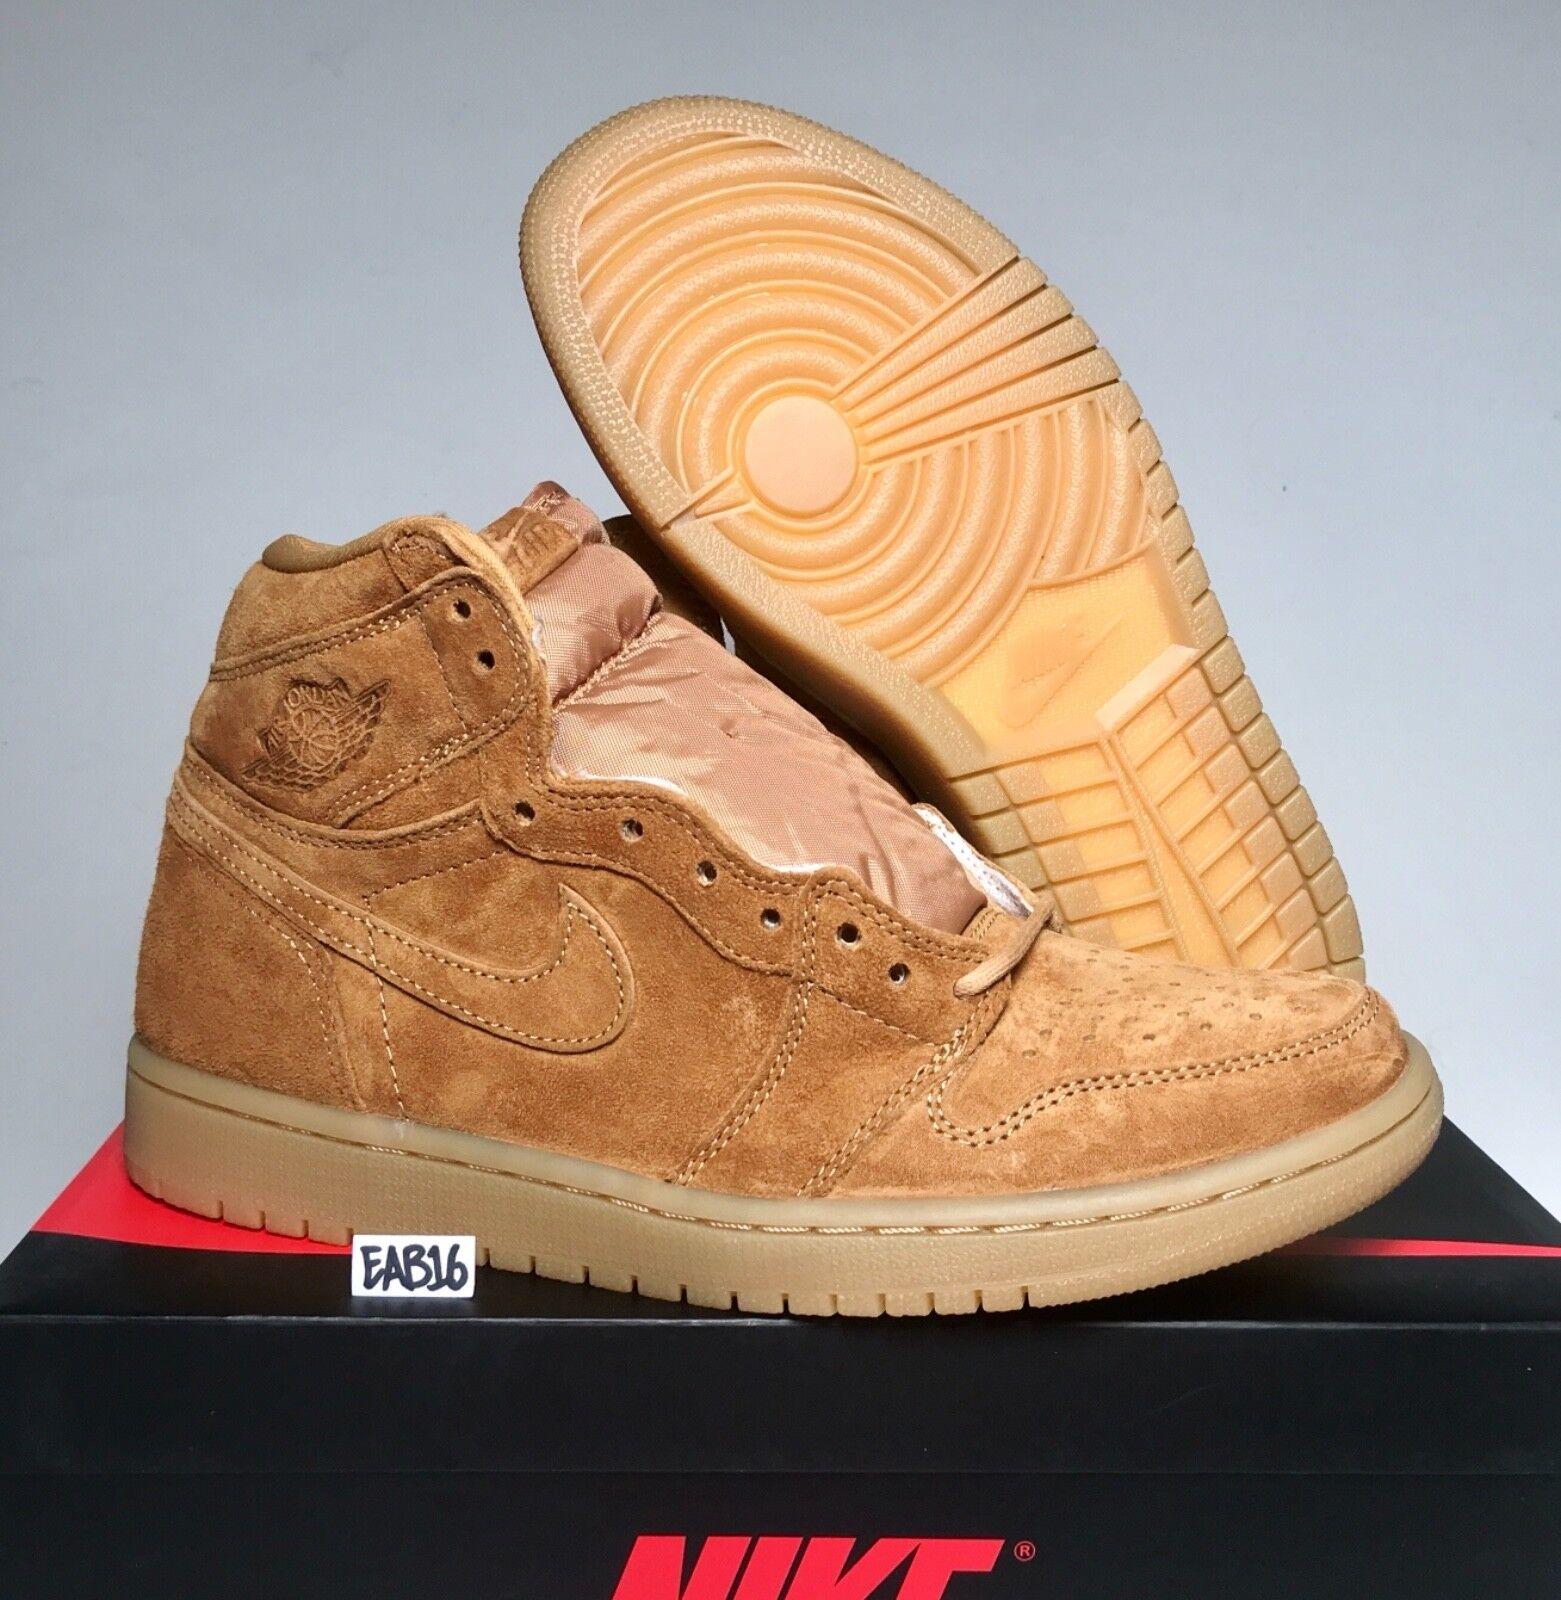 Nike air jordan retr 1 og 555088-710 alto grano raccolto d'oro 555088-710 og elementare brown a91cfc